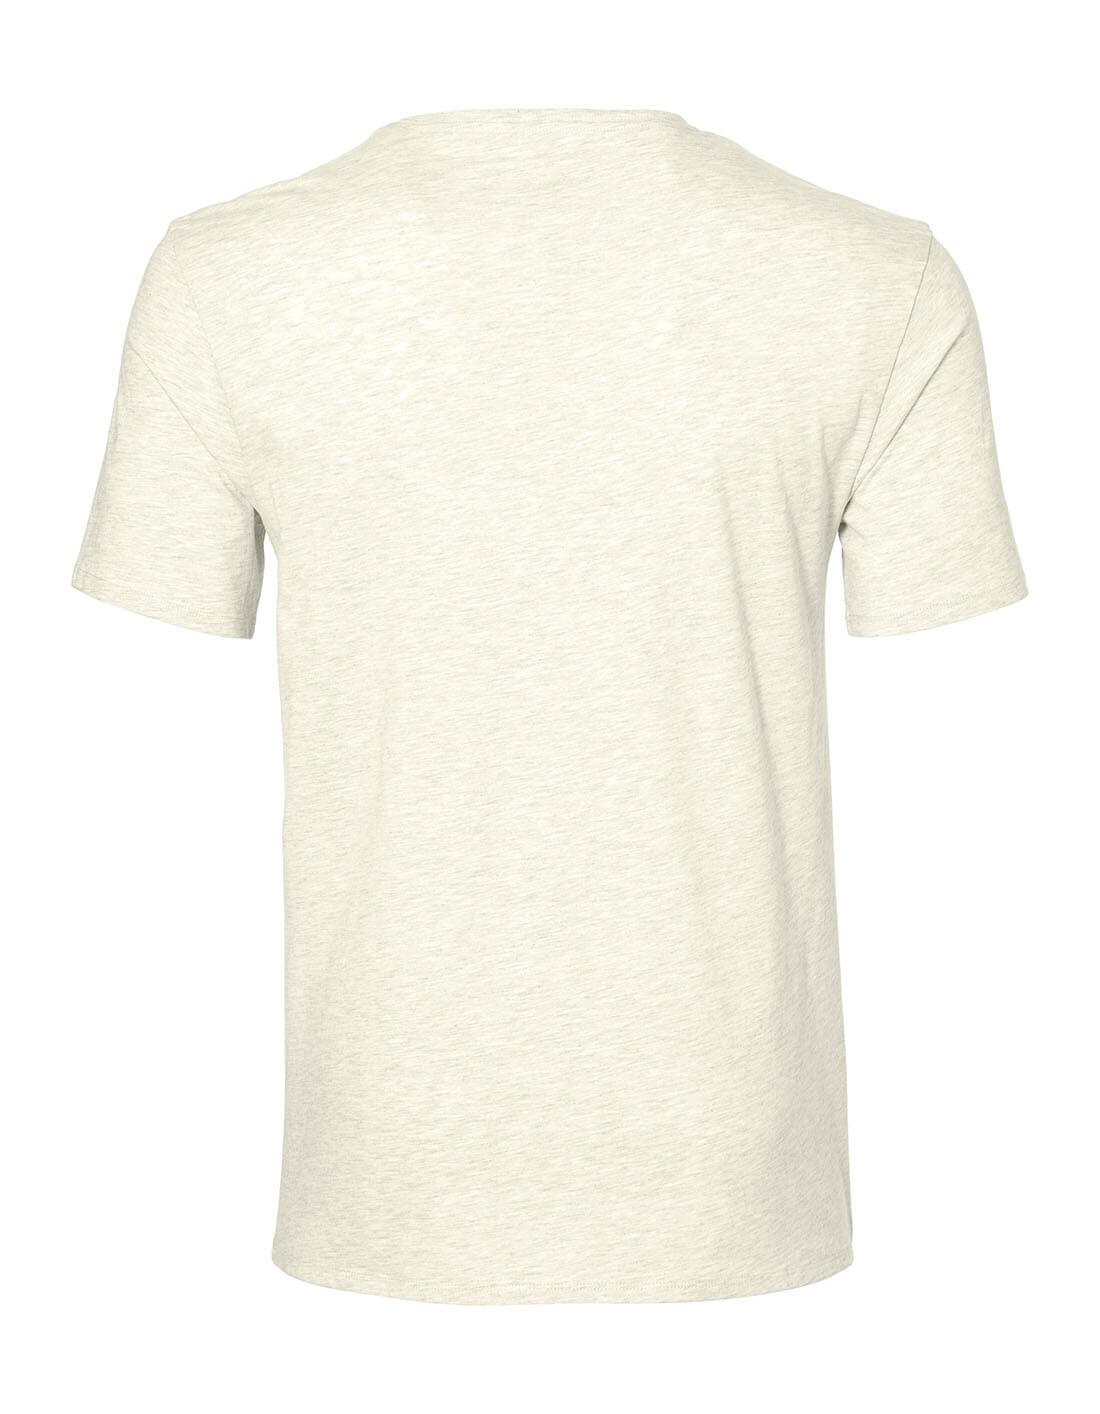 7d30e87e77 Surf Co póló - O'Neill biopamut férfi póló - EcoWear